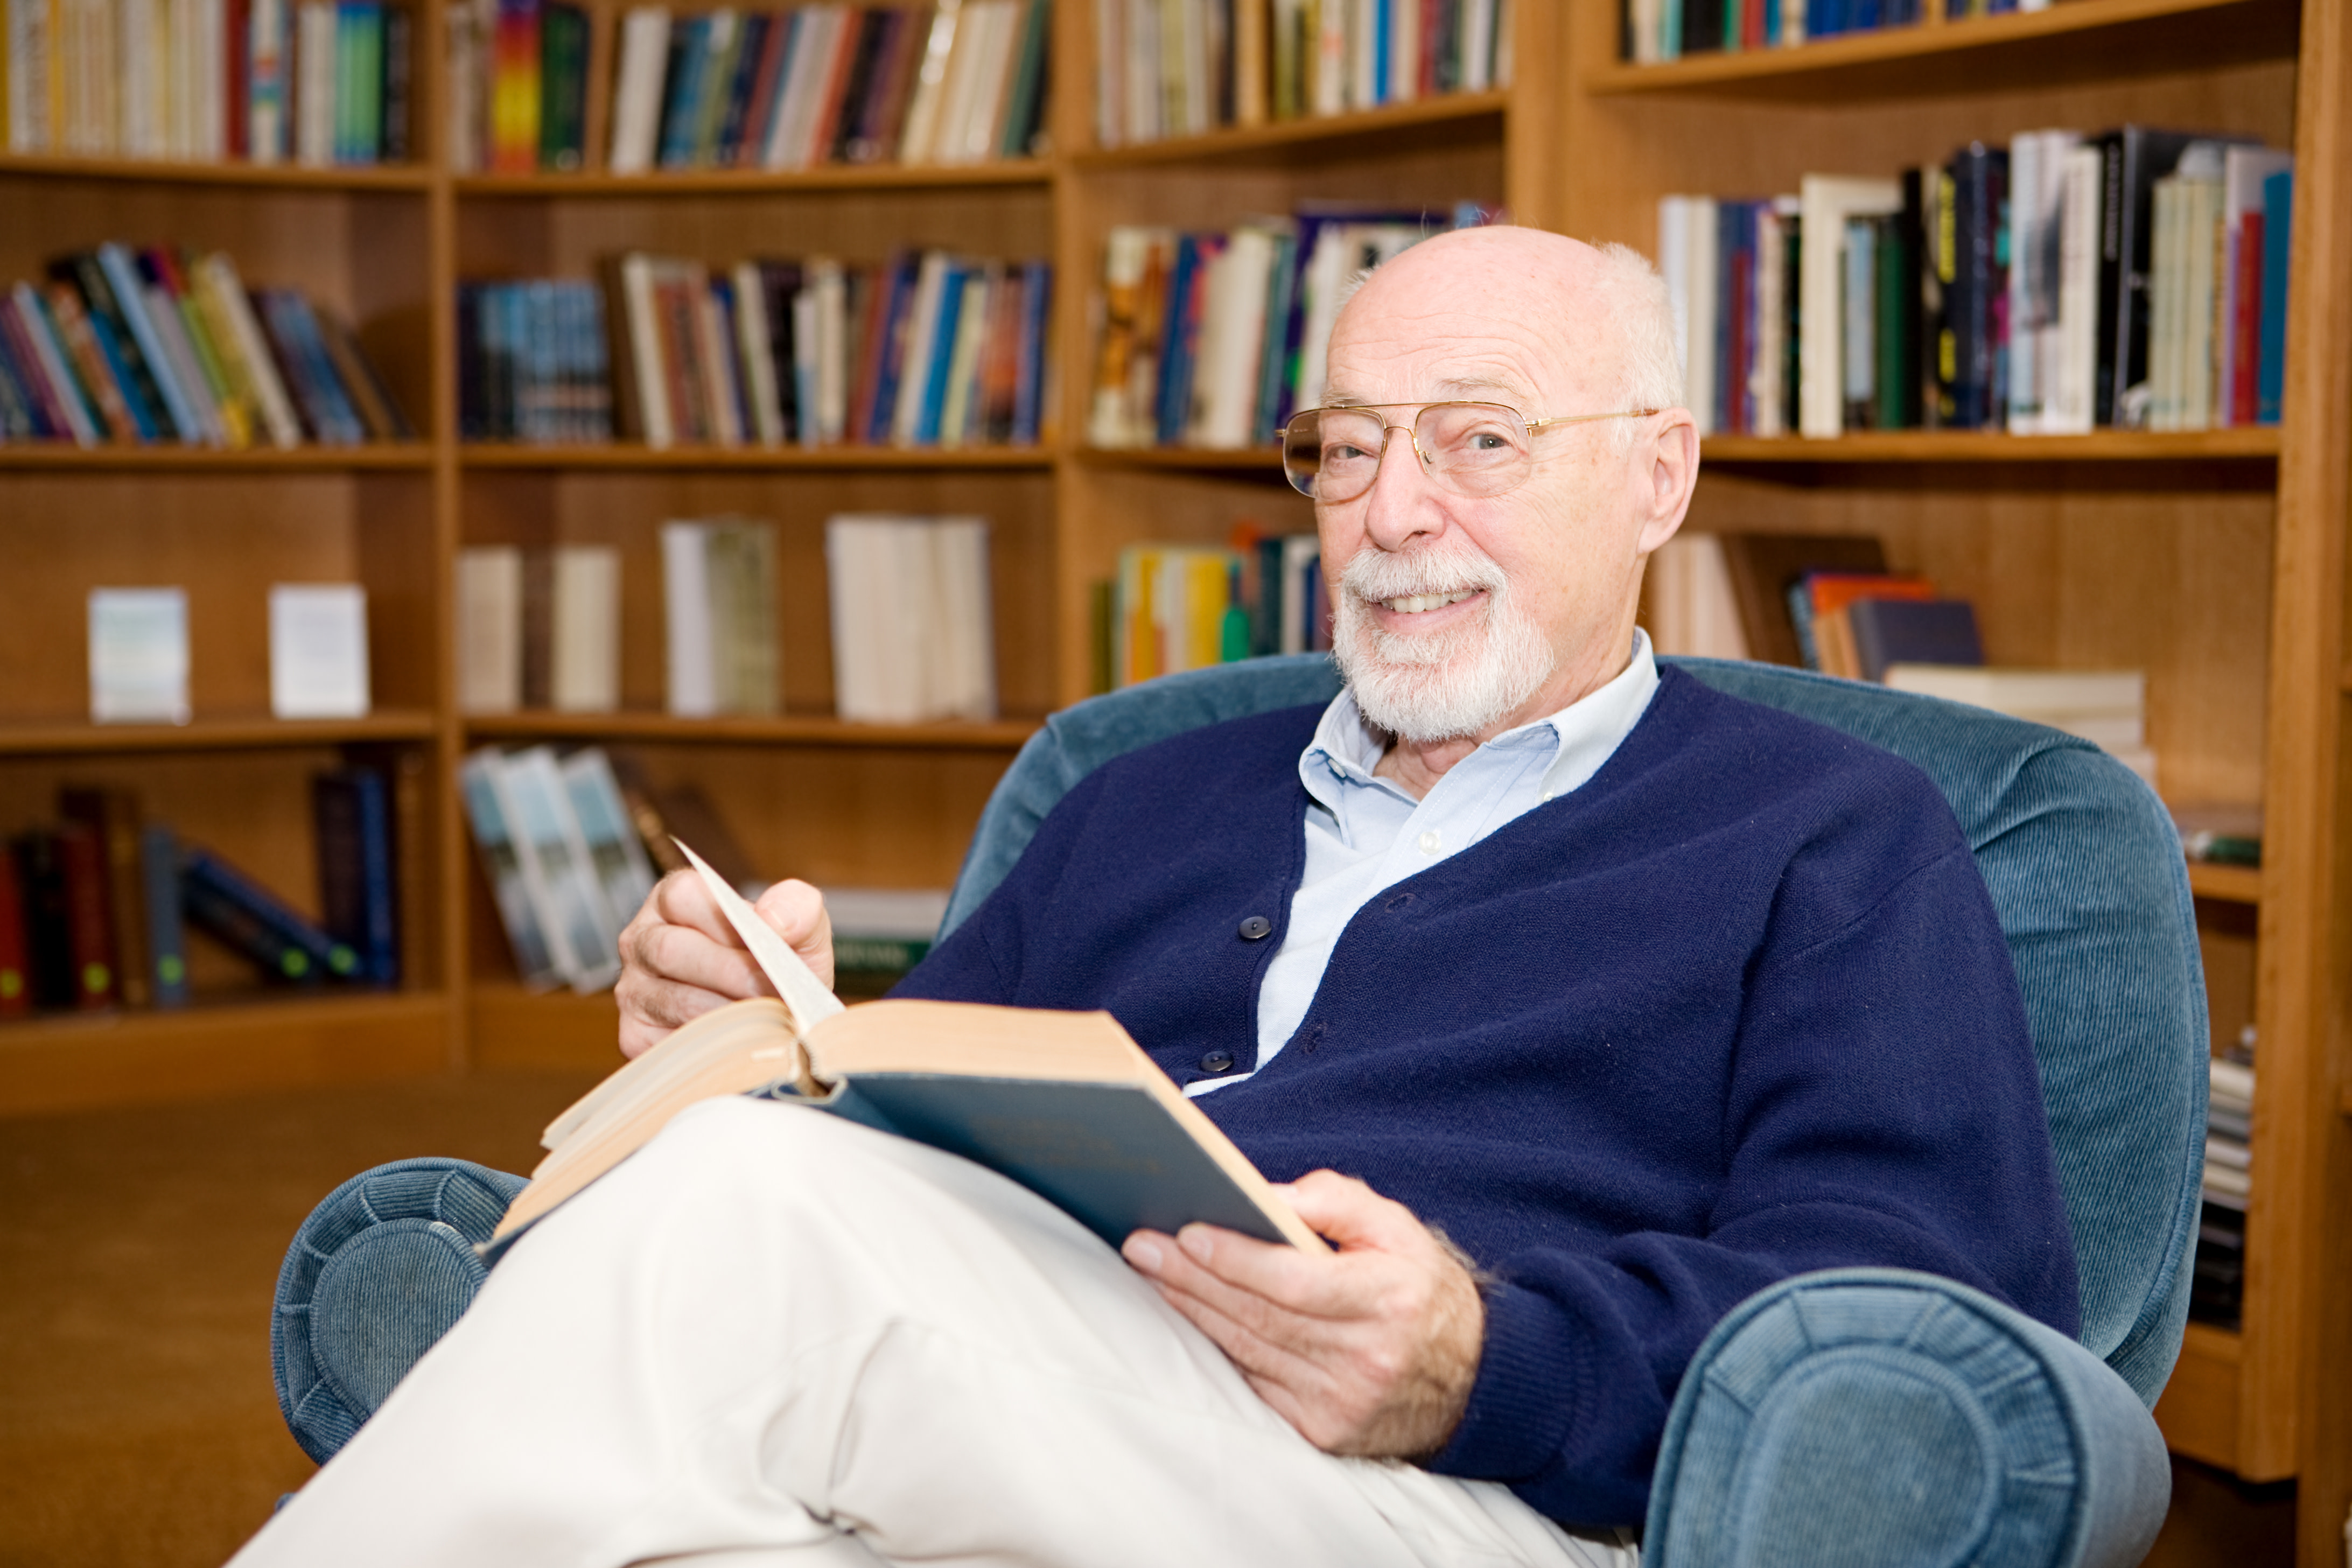 Beit Midrash of Teaneck Torah Study for Retirees